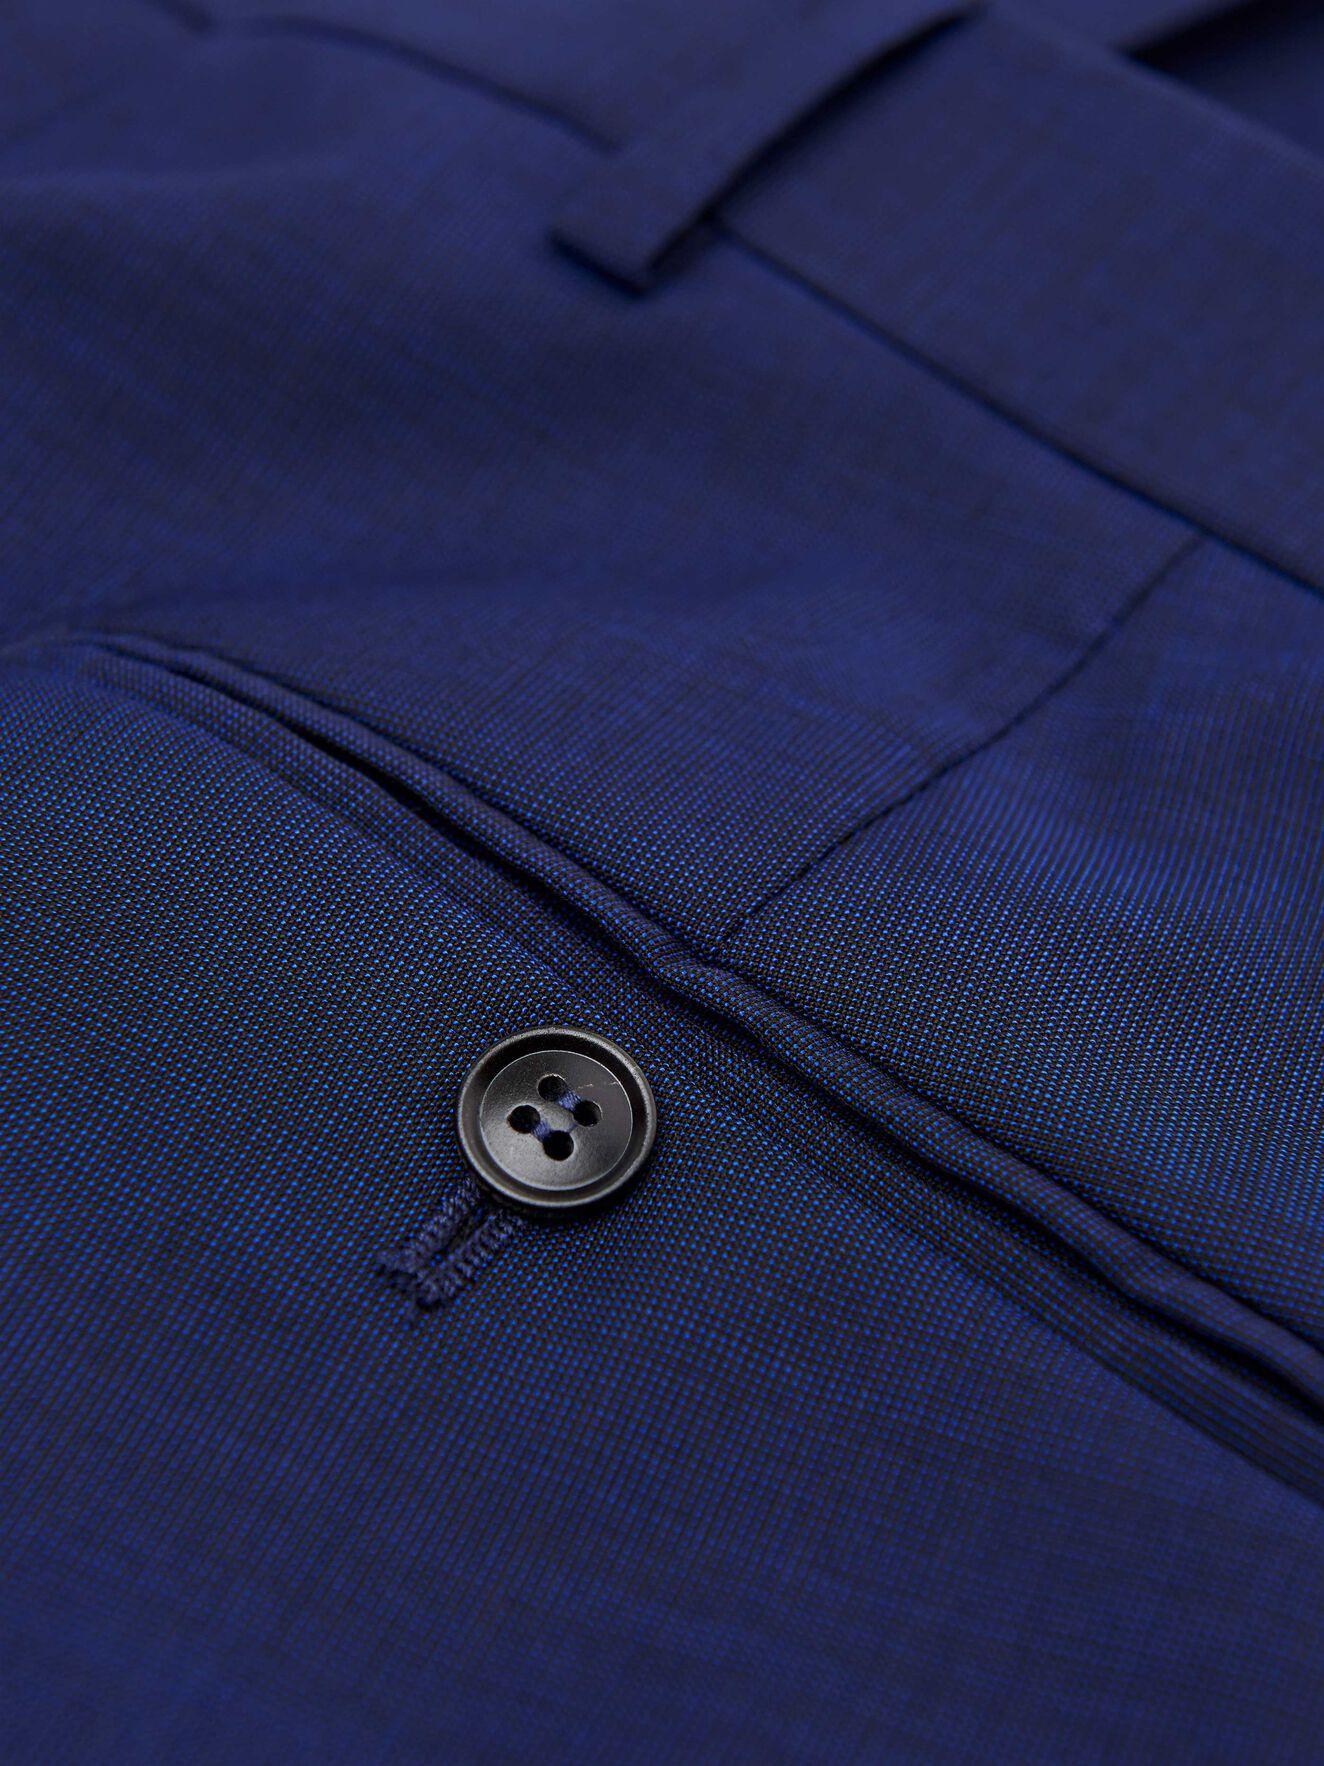 Tordon Trousers in Deep Ocean Blue from Tiger of Sweden